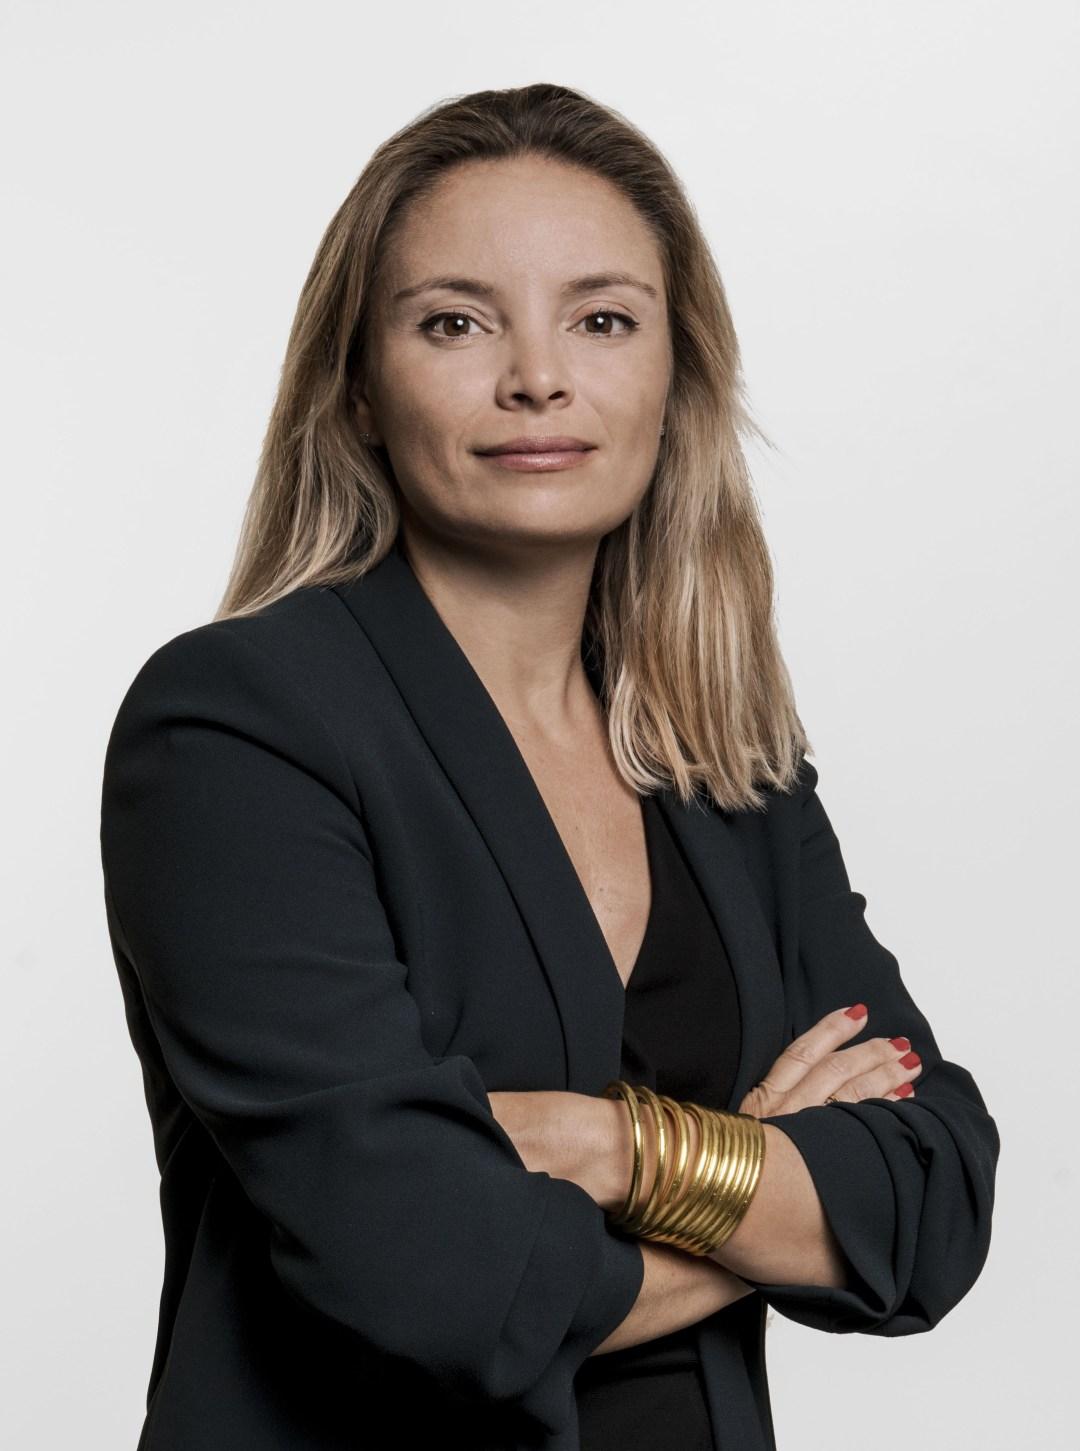 Alejandra Fraile